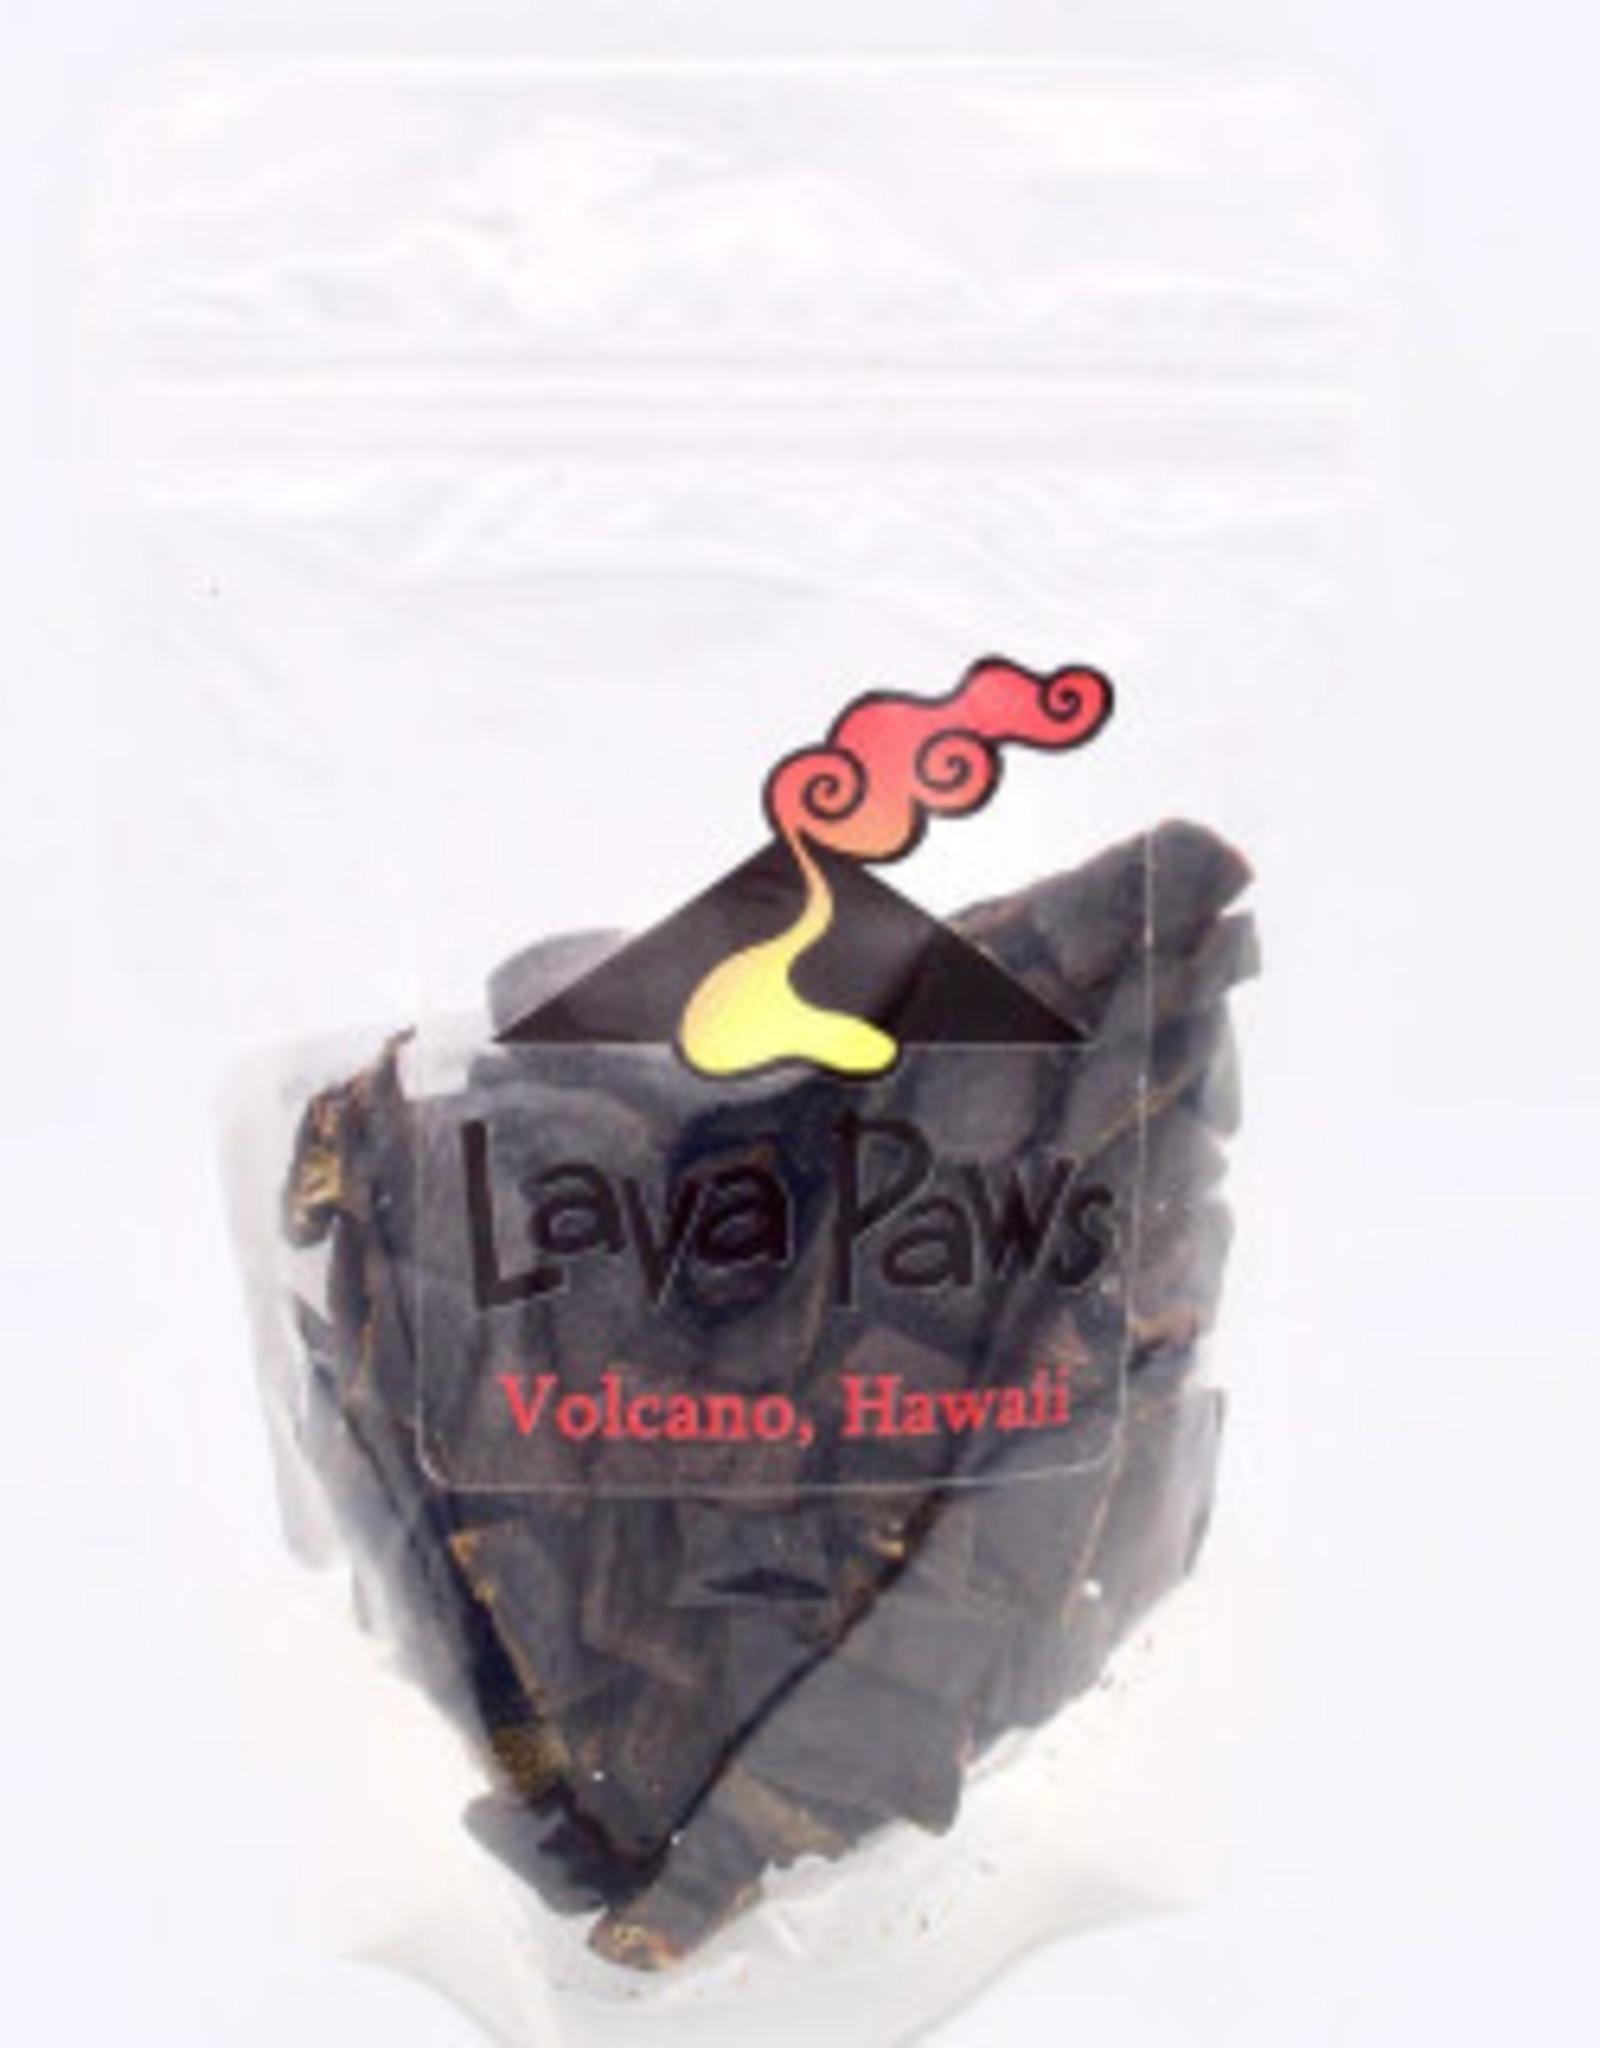 Lava Paws Lava Paws Beef Liver 4z